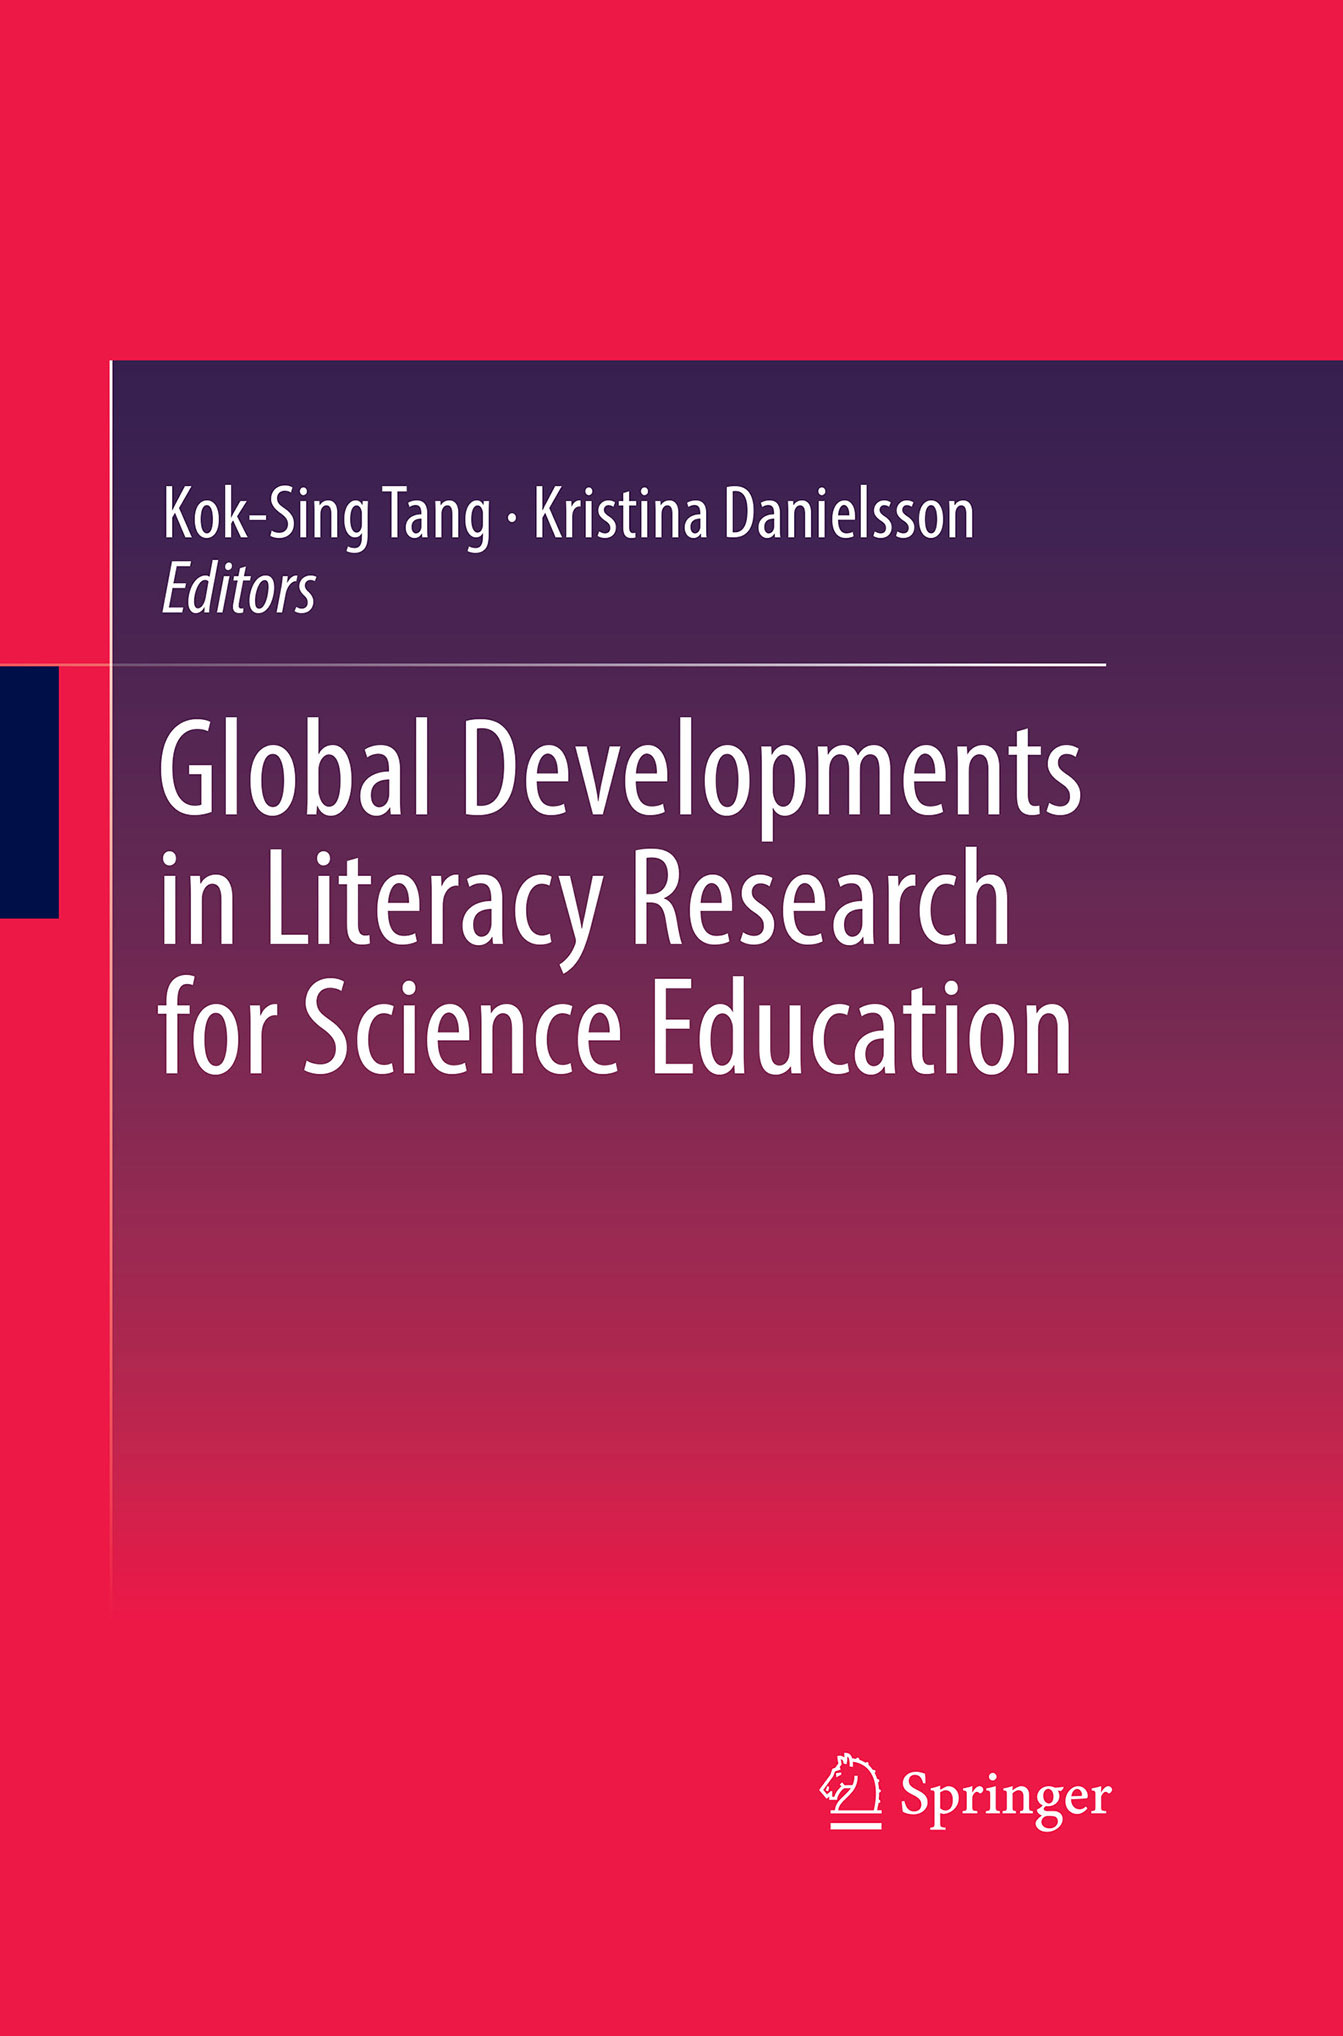 Danielsson, Kristina - Global Developments in Literacy Research for Science Education, ebook